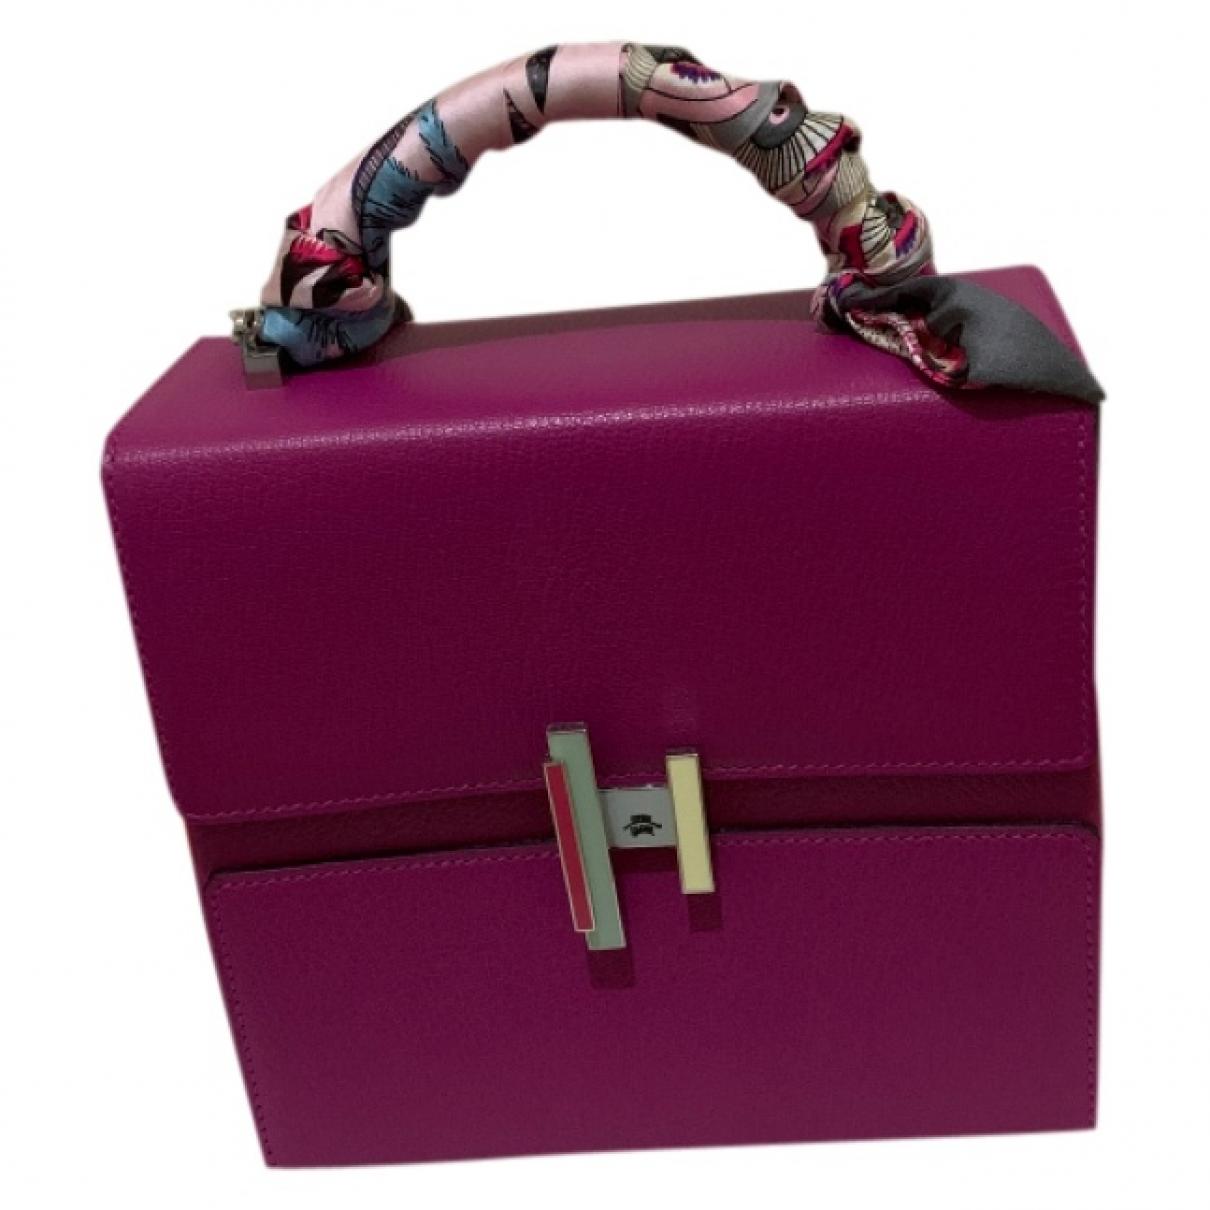 Hermes Cinhetic Handtasche in  Lila Leder